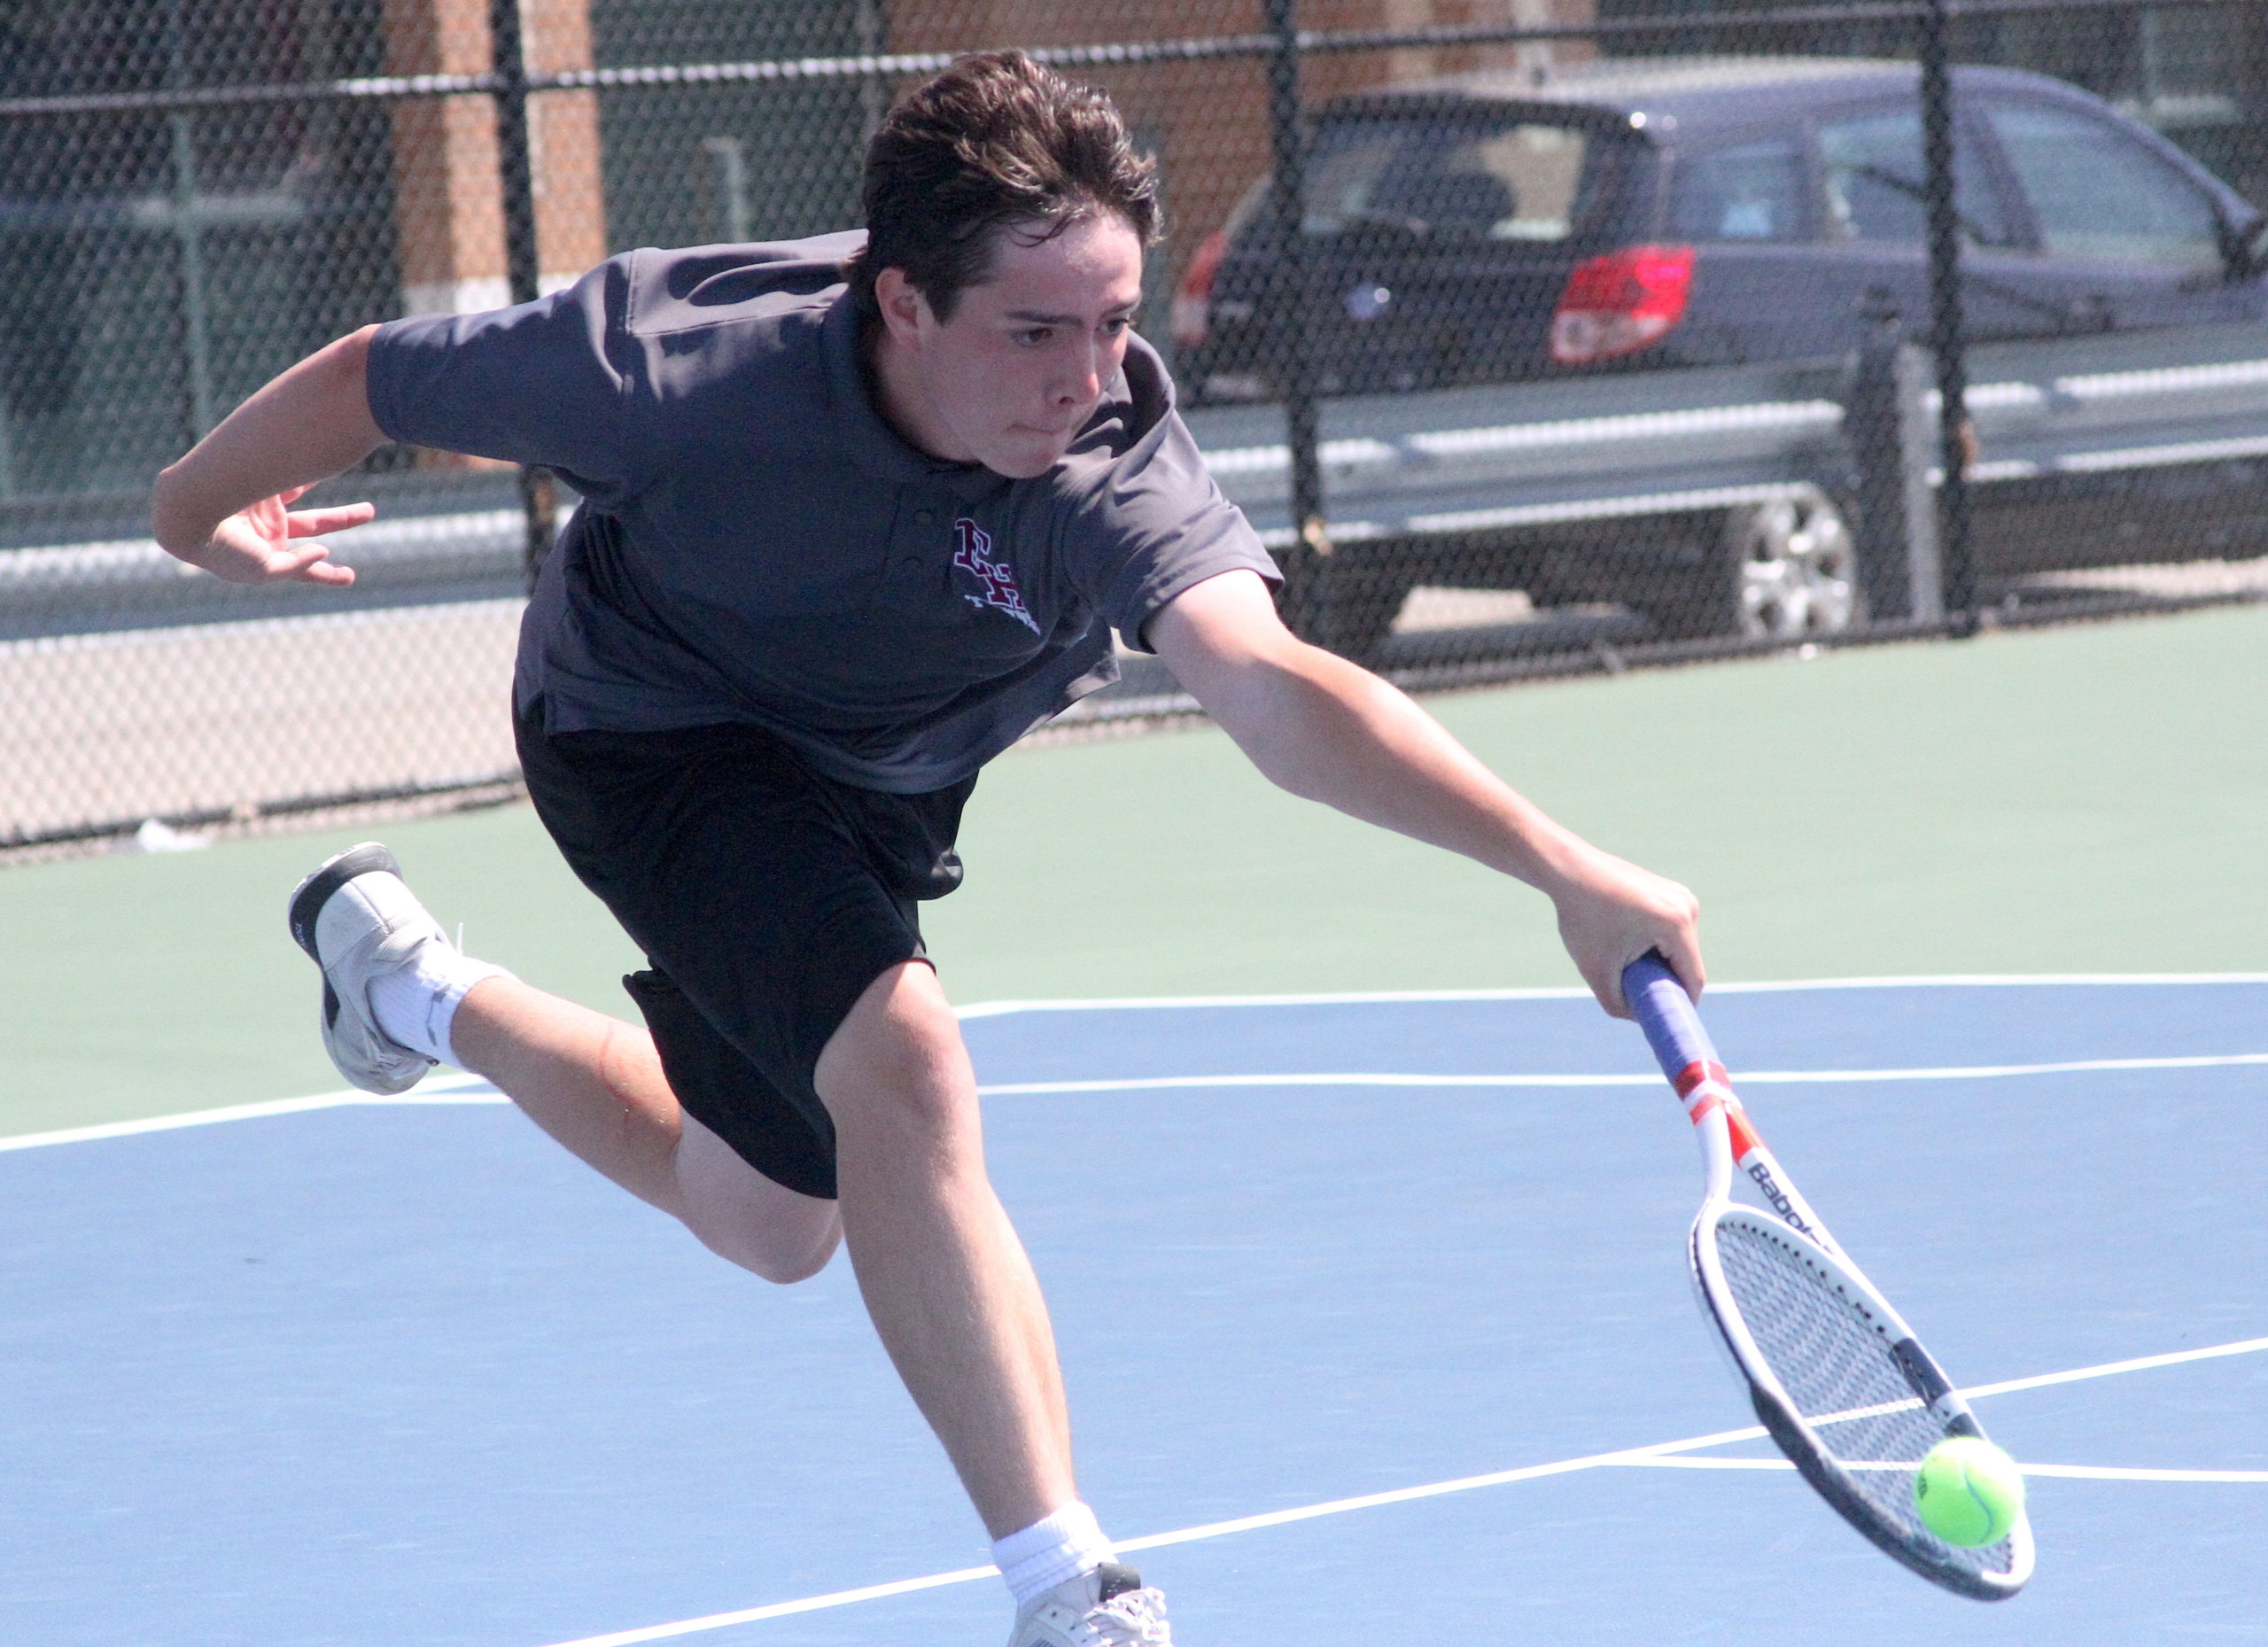 East Hampton freshman Nick Cooper races to return the ball in his Division IV quarterfinals match. DESIRÉE KEEGAN